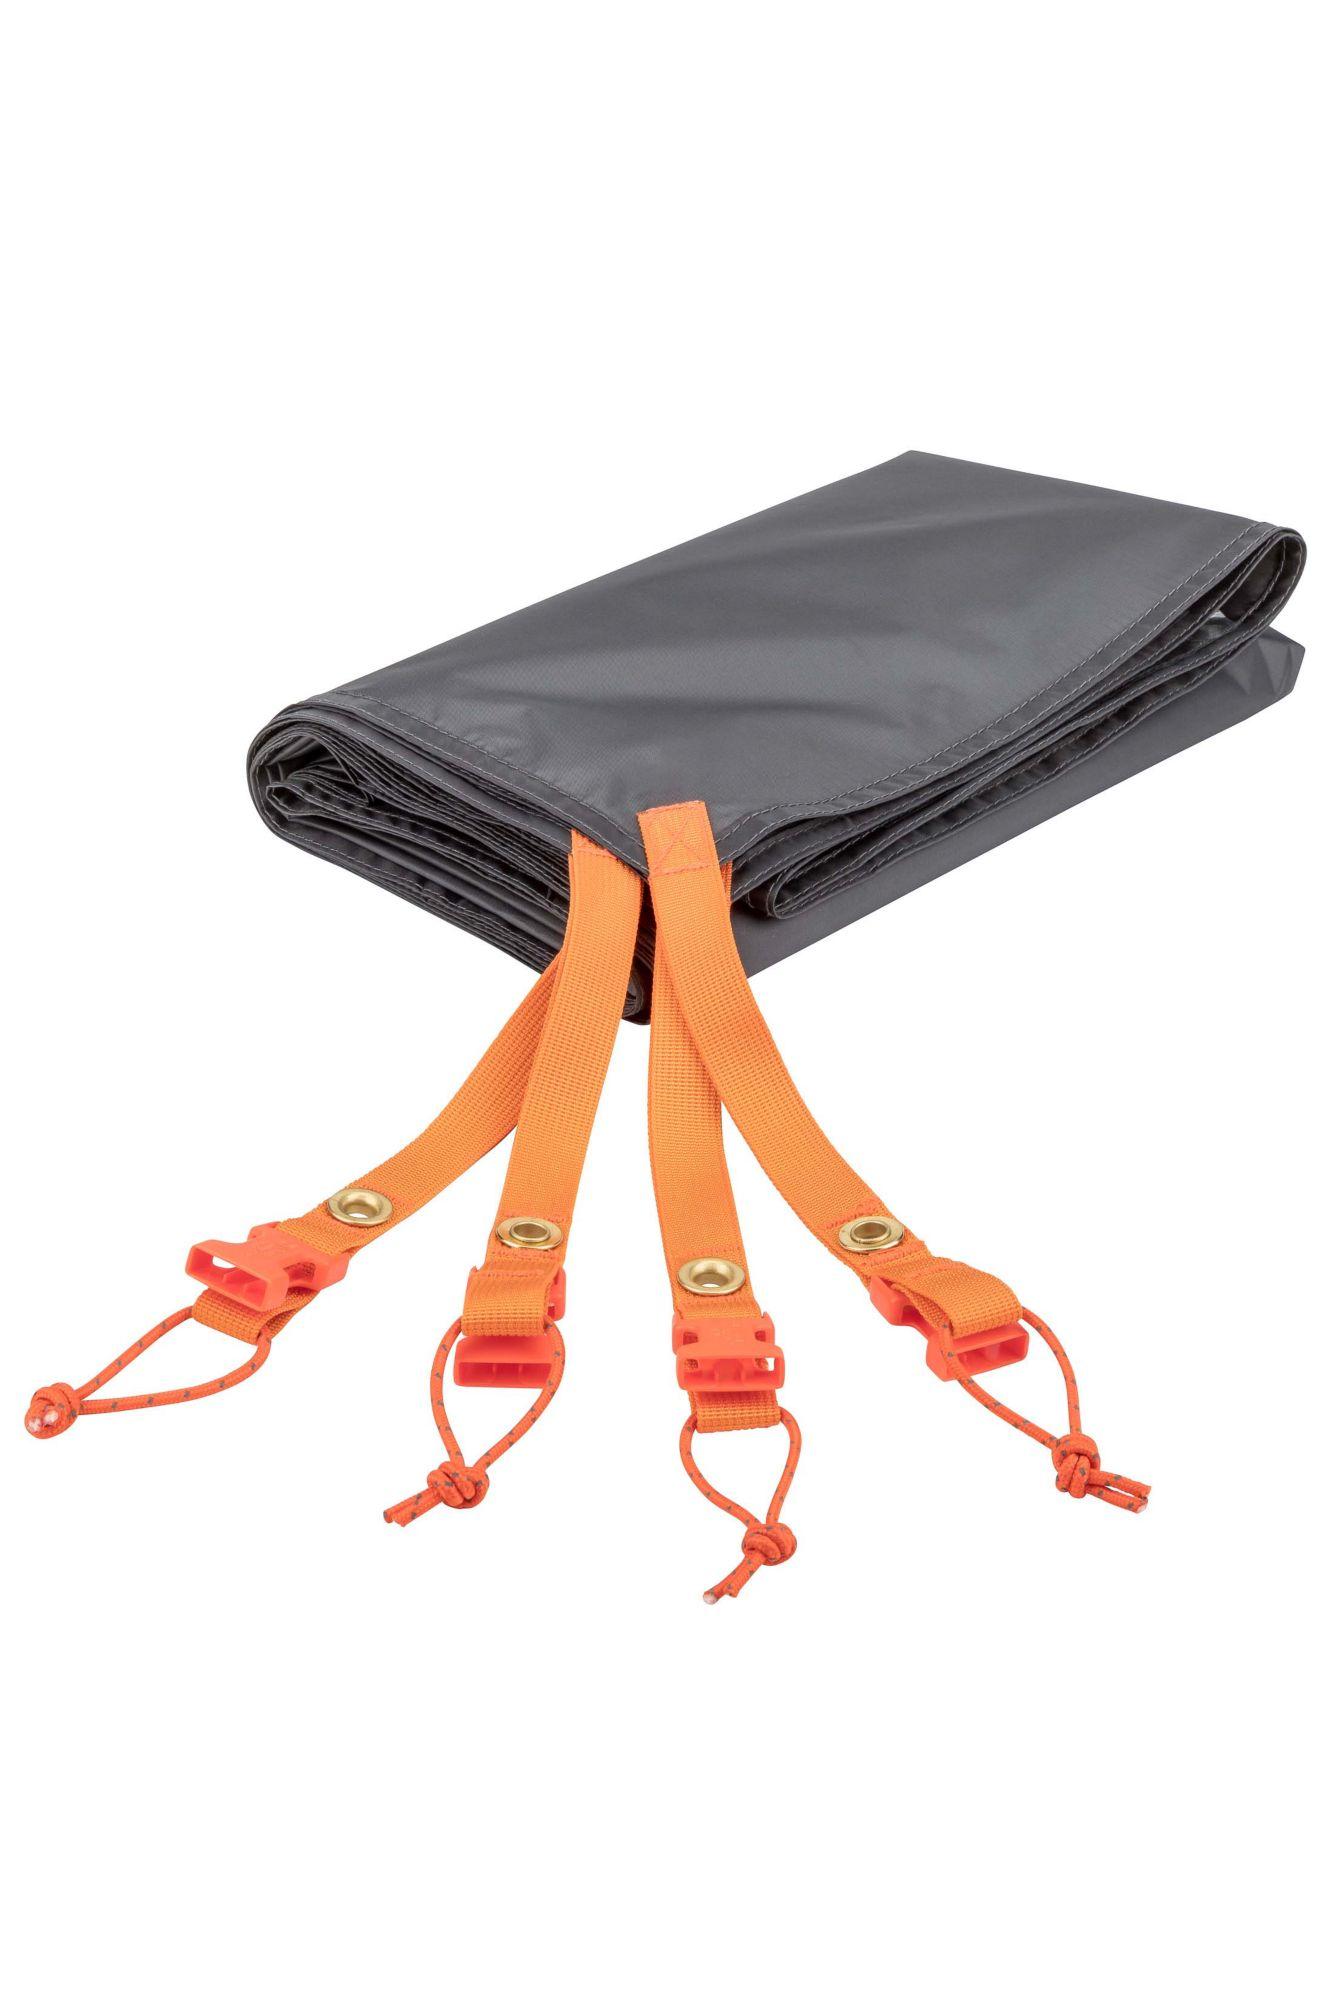 Limelight 2P Footprint Slate Grey medium  sc 1 st  Marmot & 2 Person Tents / Tents / Equipment | Marmot.com